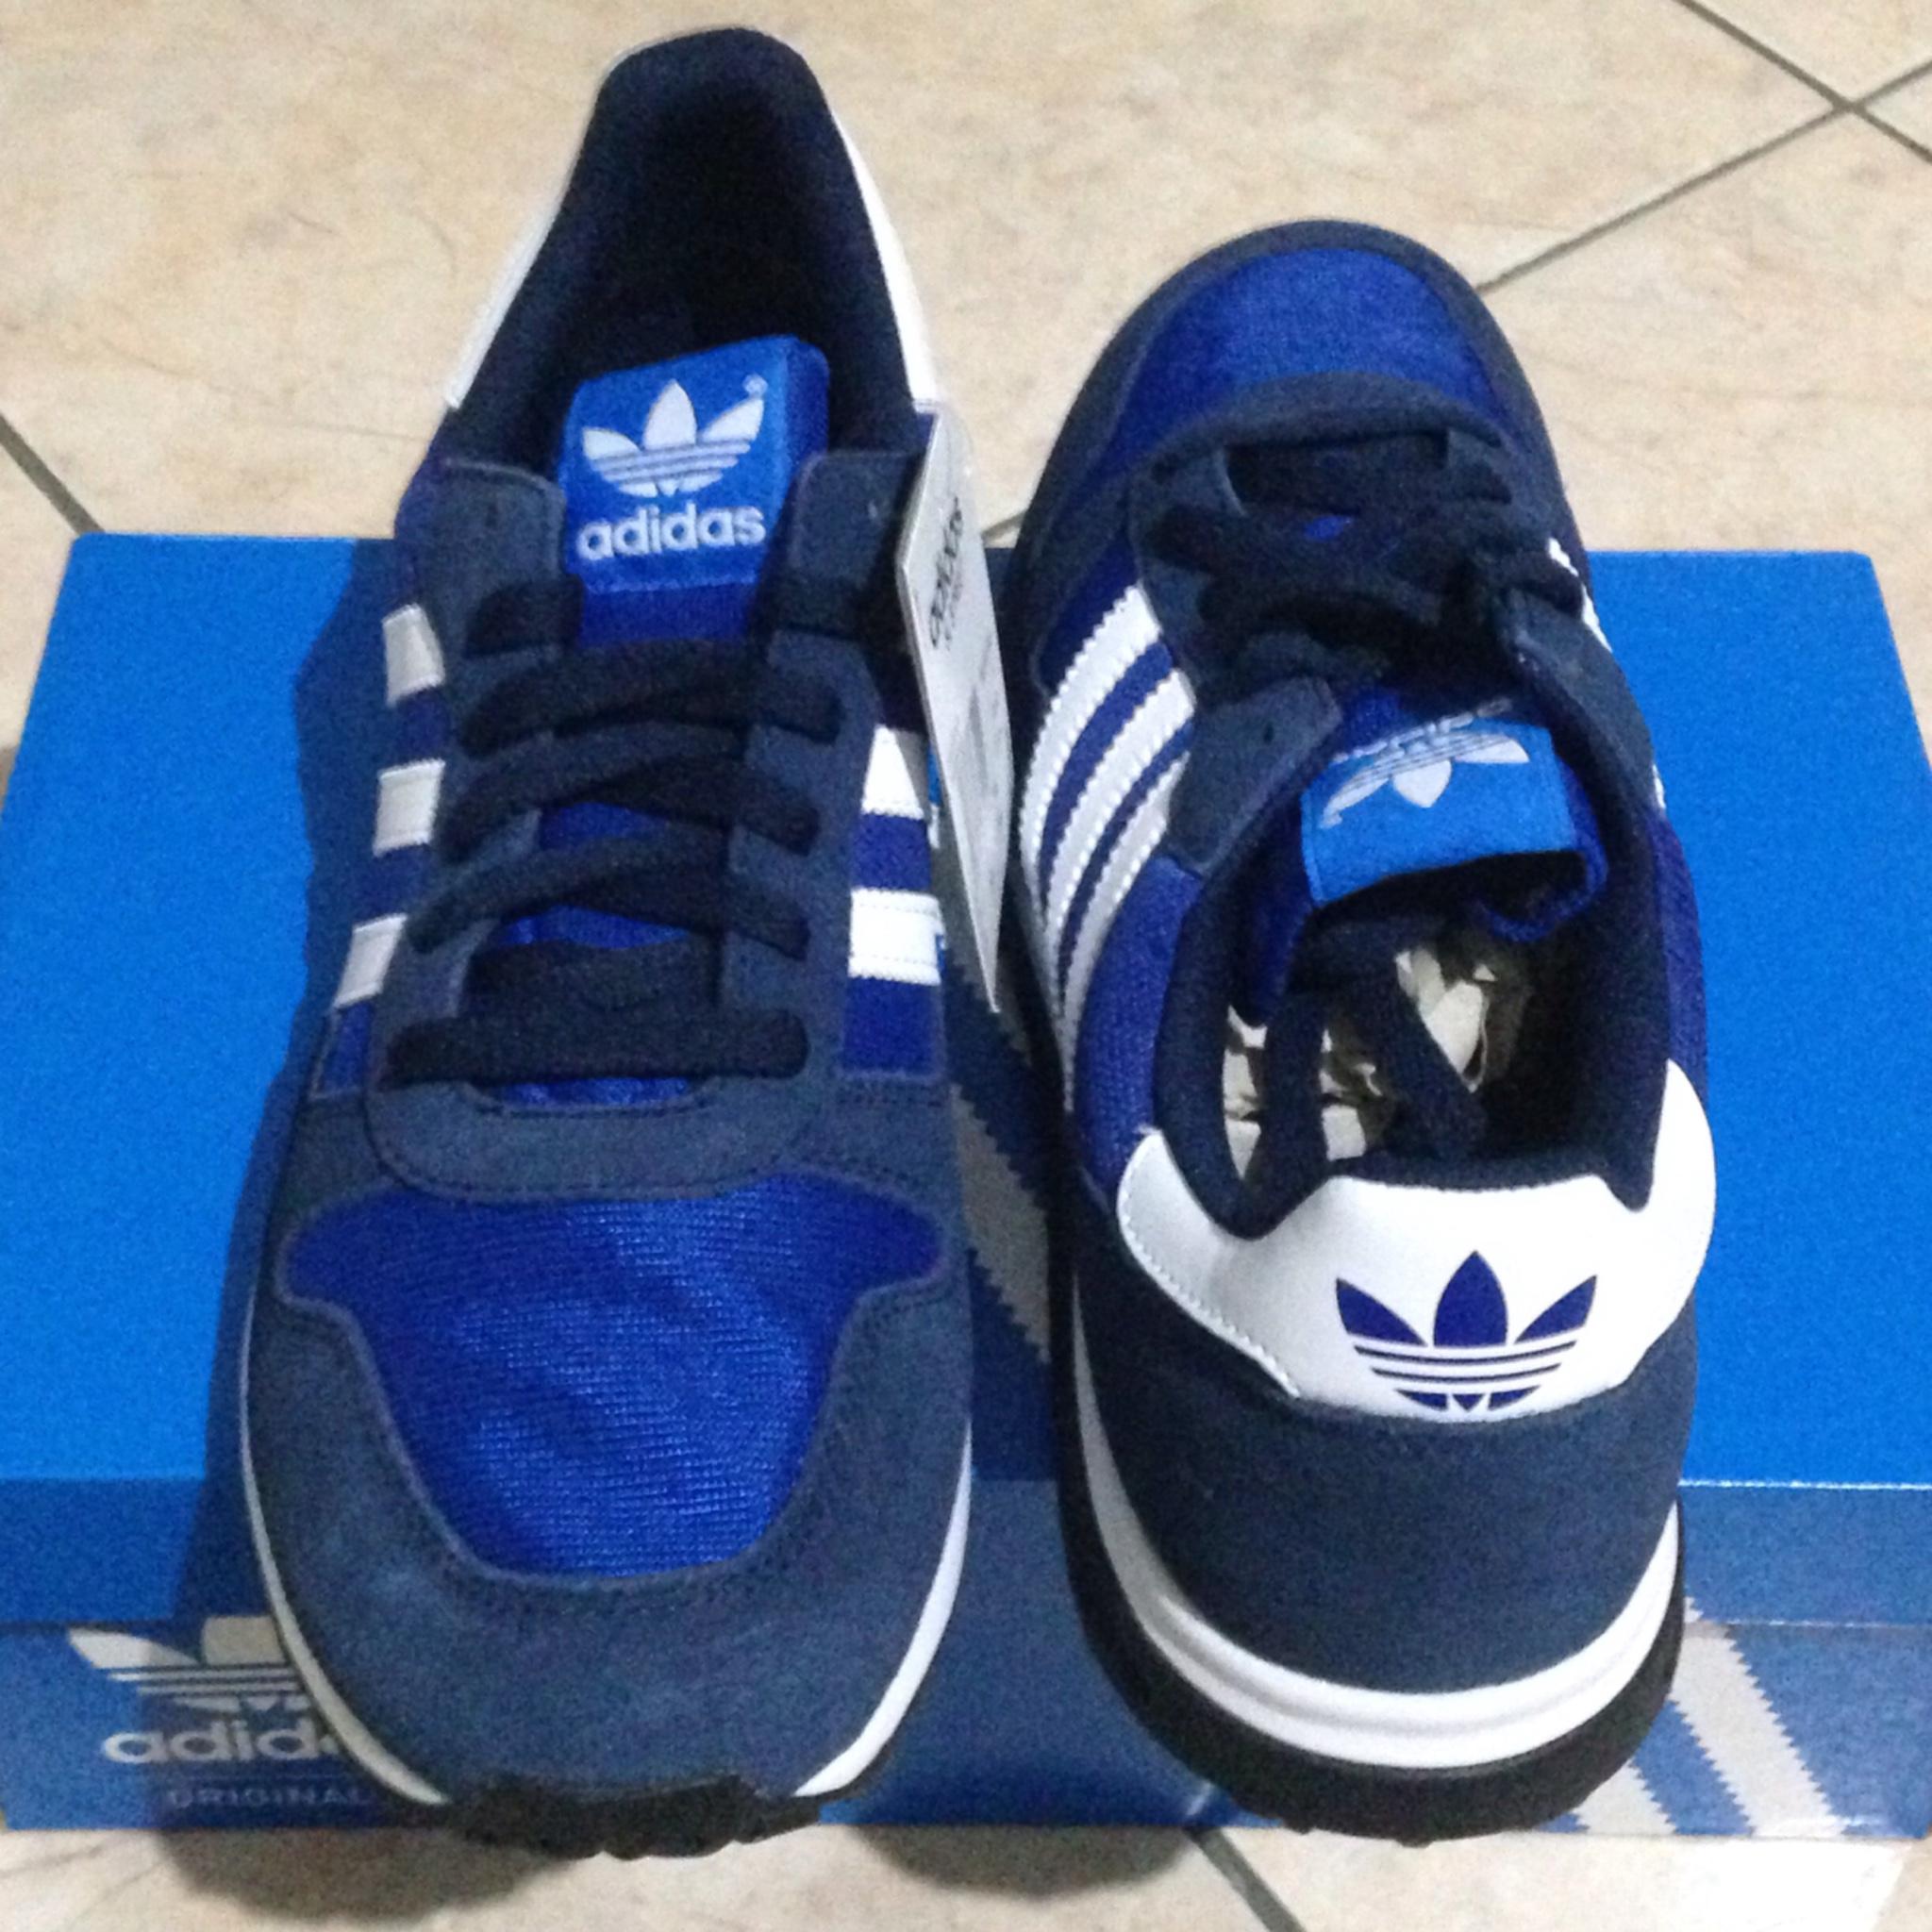 dc13e4038ac4d get sepatu adidas zx 850 original 50d00 bcd63  low cost sepatu 2017 outlet  5edc6 fa2a8 jual sepatu adidas blue original sun sea tokopedia 8fe9f